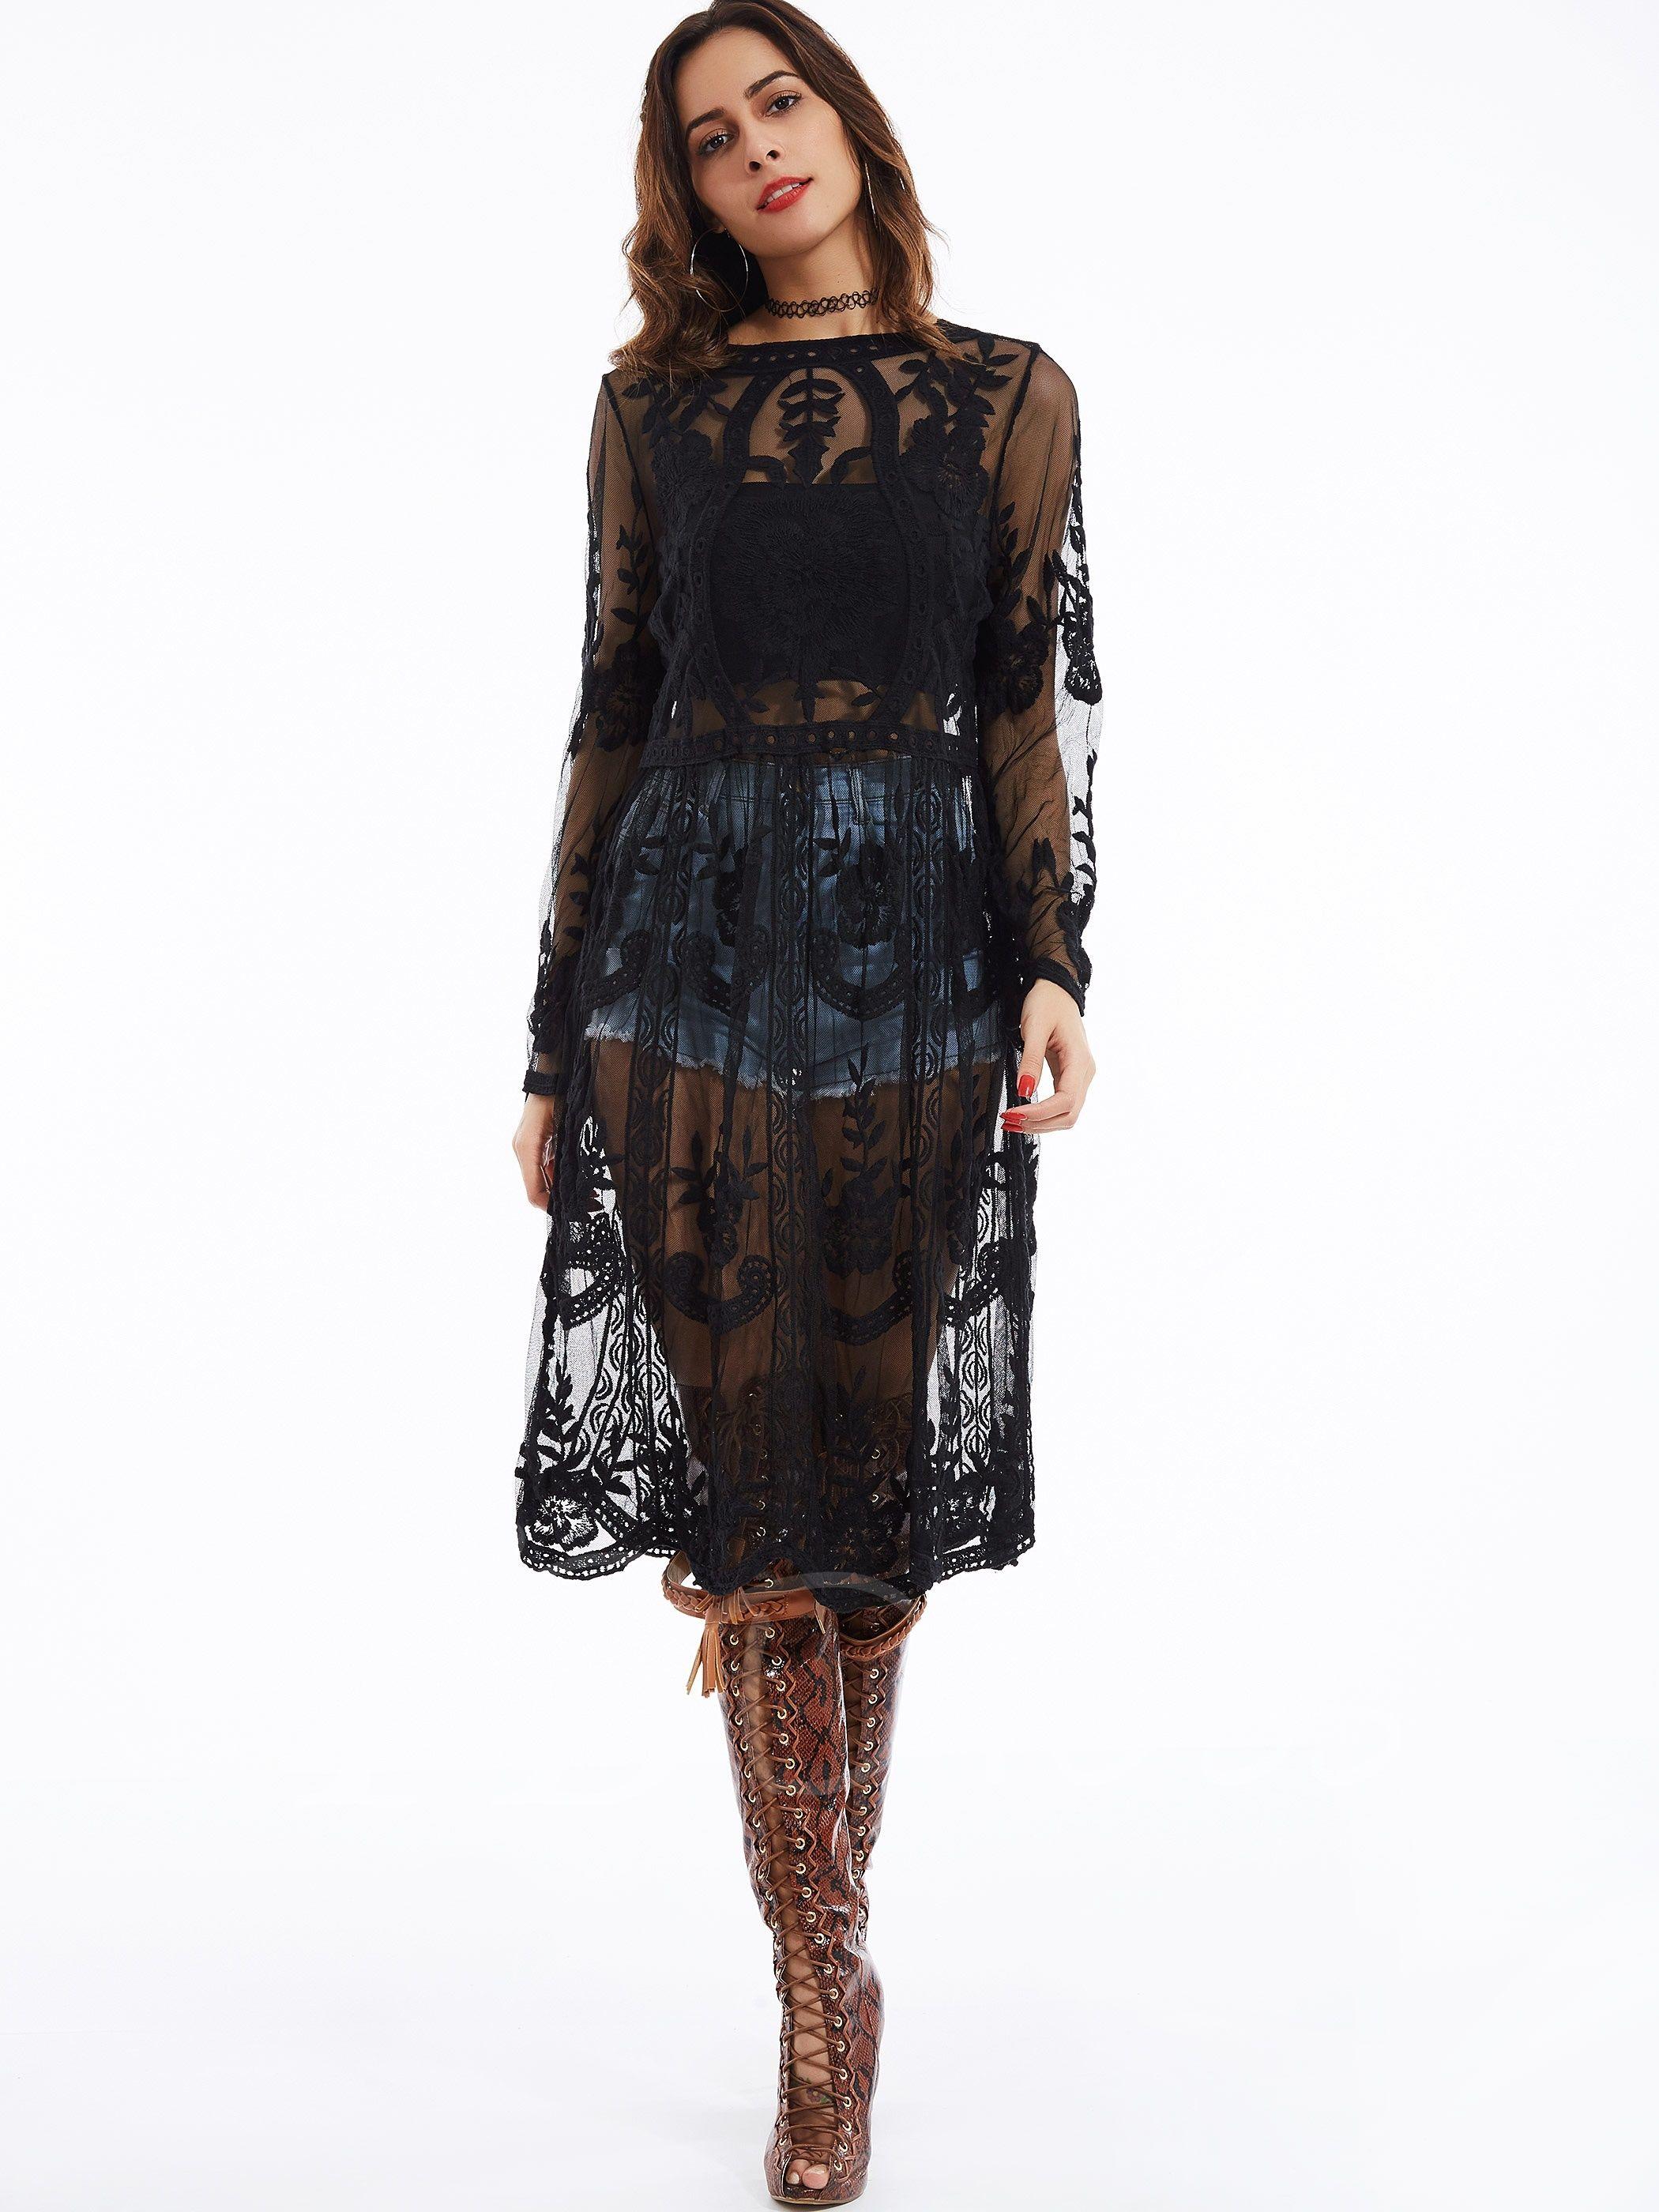 Black See Through Women S Lace Dress Women Lace Dress Lace Dress Dresses [ 2800 x 2100 Pixel ]